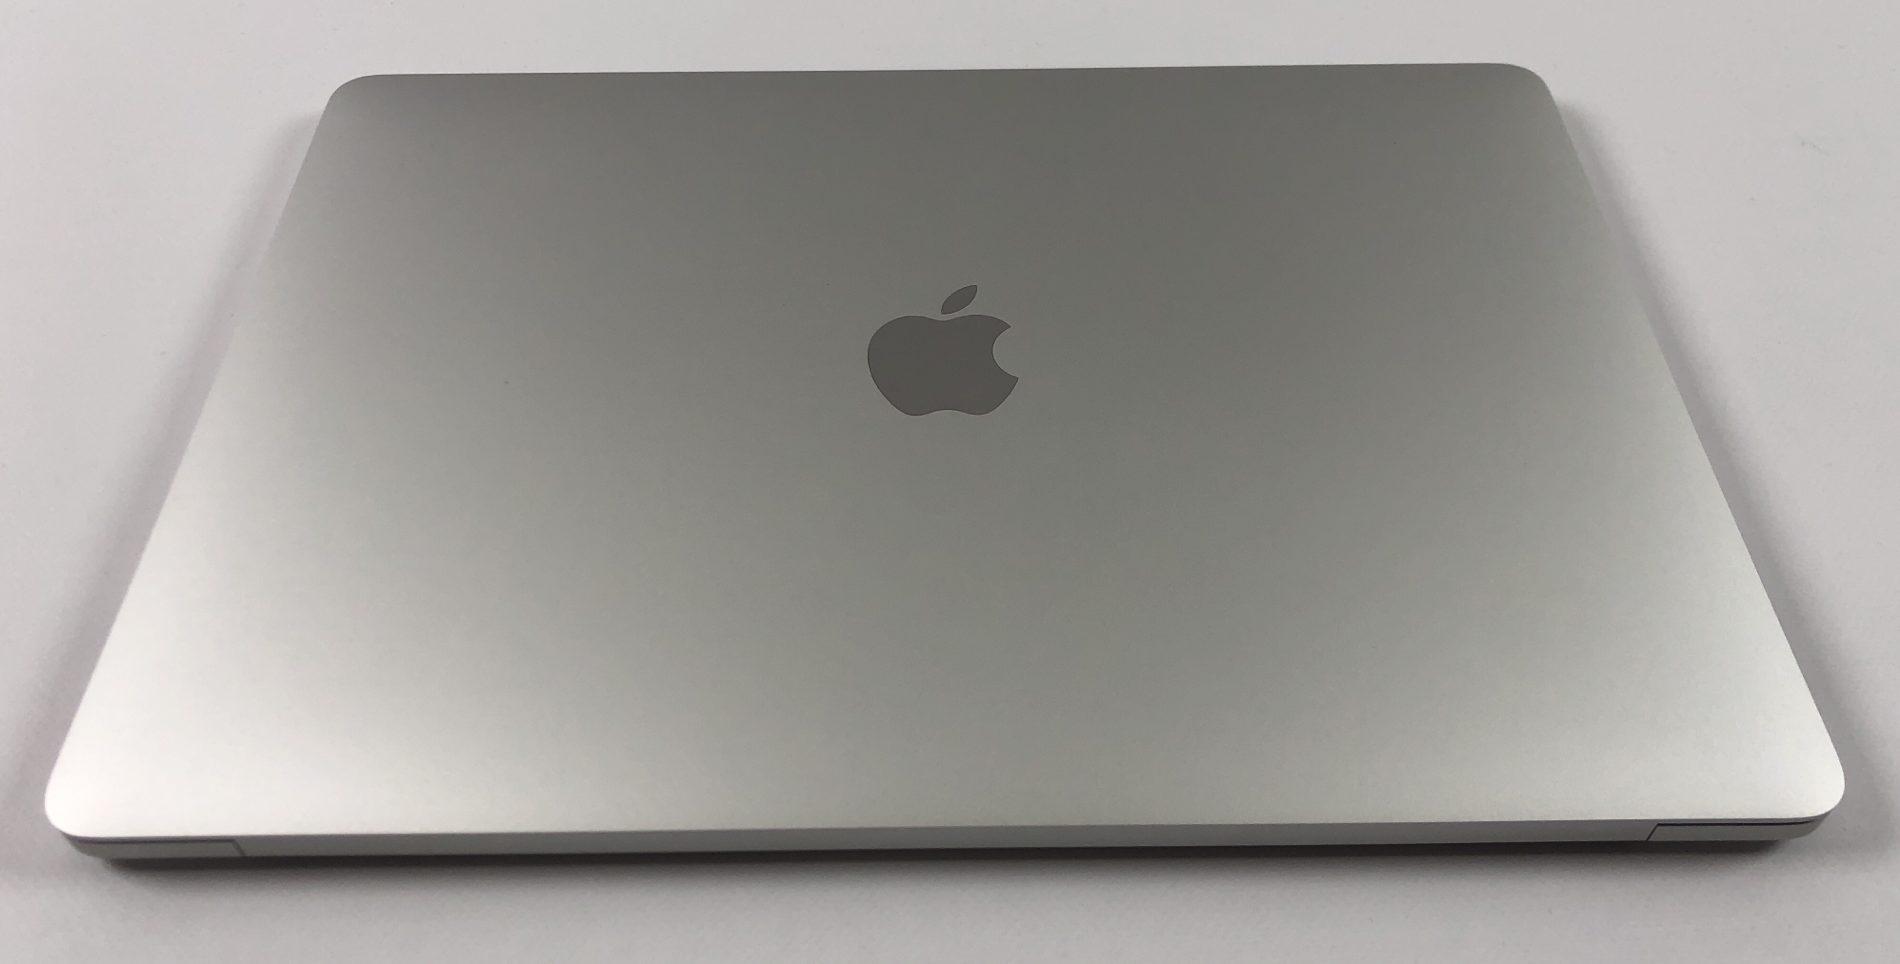 "MacBook Pro 13"" 4TBT Late 2016 (Intel Core i5 2.9 GHz 8 GB RAM 512 GB SSD), Silver, Intel Core i5 2.9 GHz, 8 GB RAM, 512 GB SSD, bild 2"